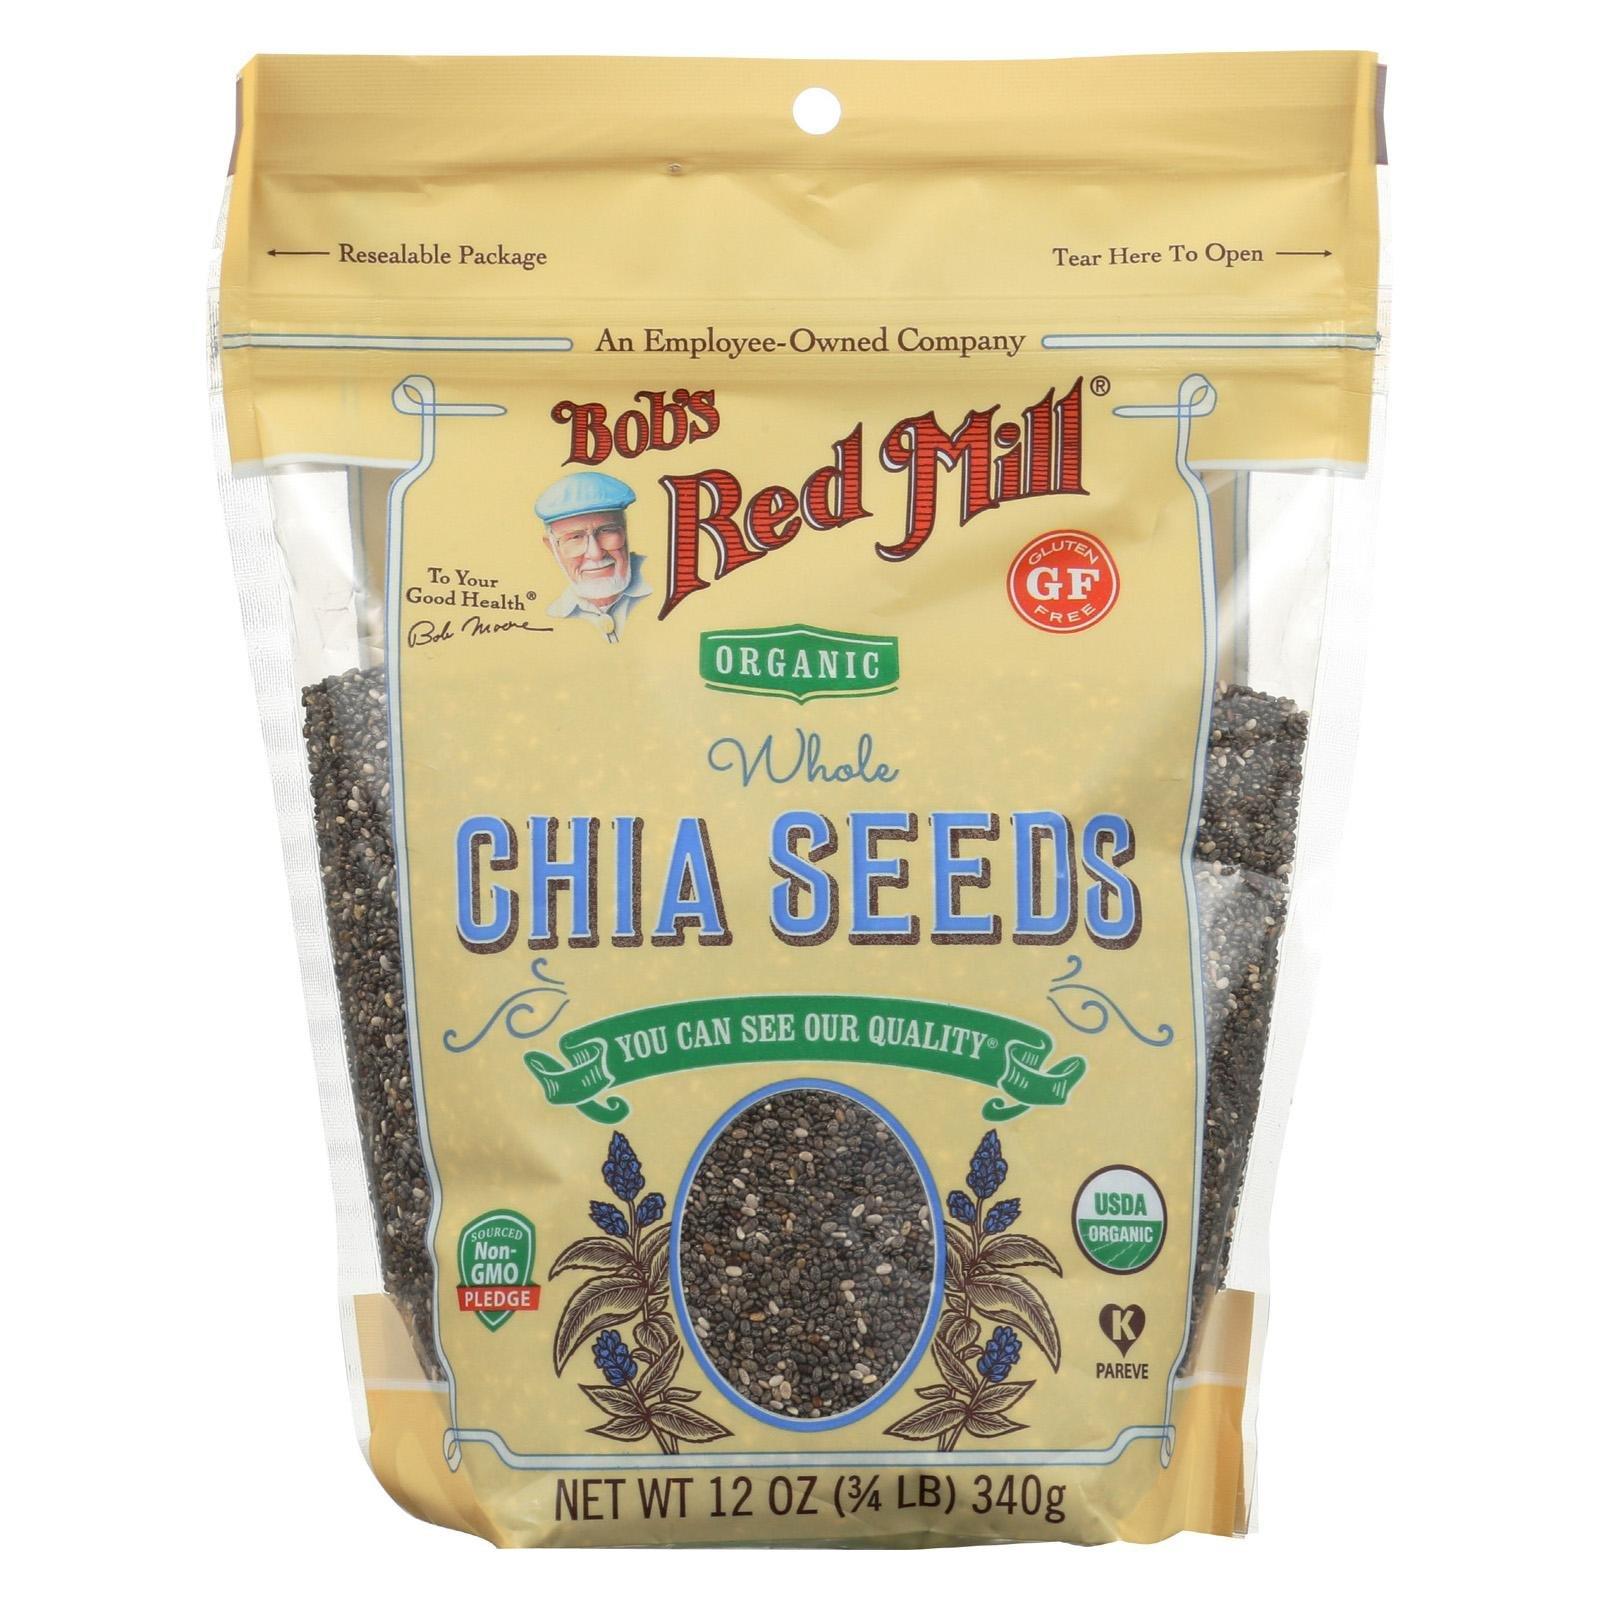 BOB'S RED MILL, Organic Seeds, Chia, Pack of 6, Size 12 OZ, (Gluten Free Kosher 95%+ Organic)